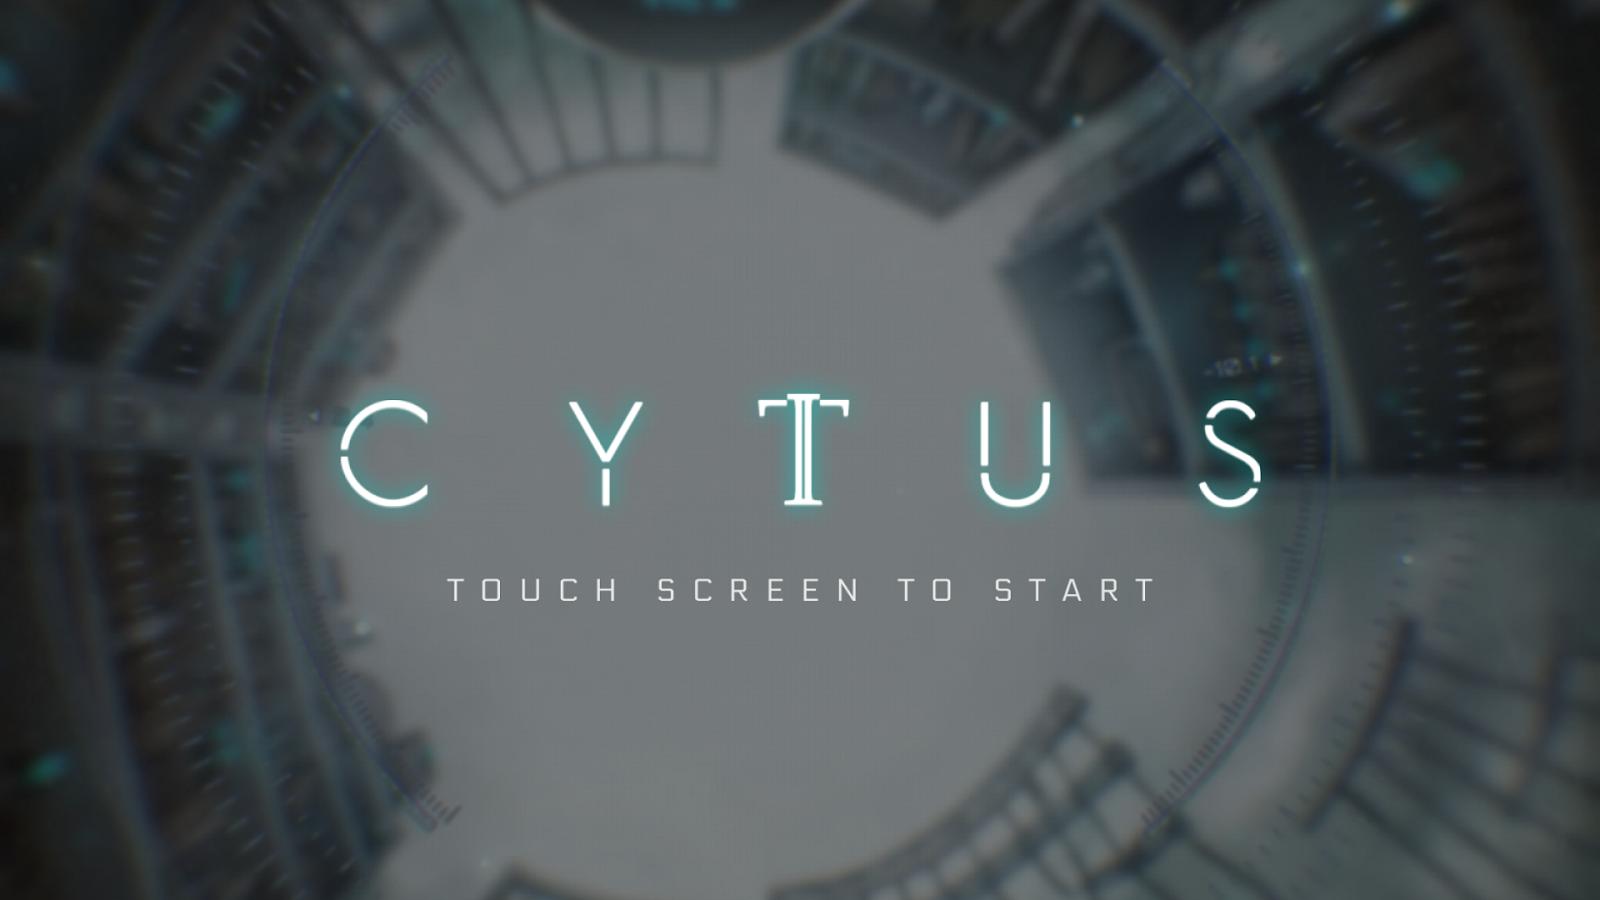 Download Cytus II 2.3.9 APK Info